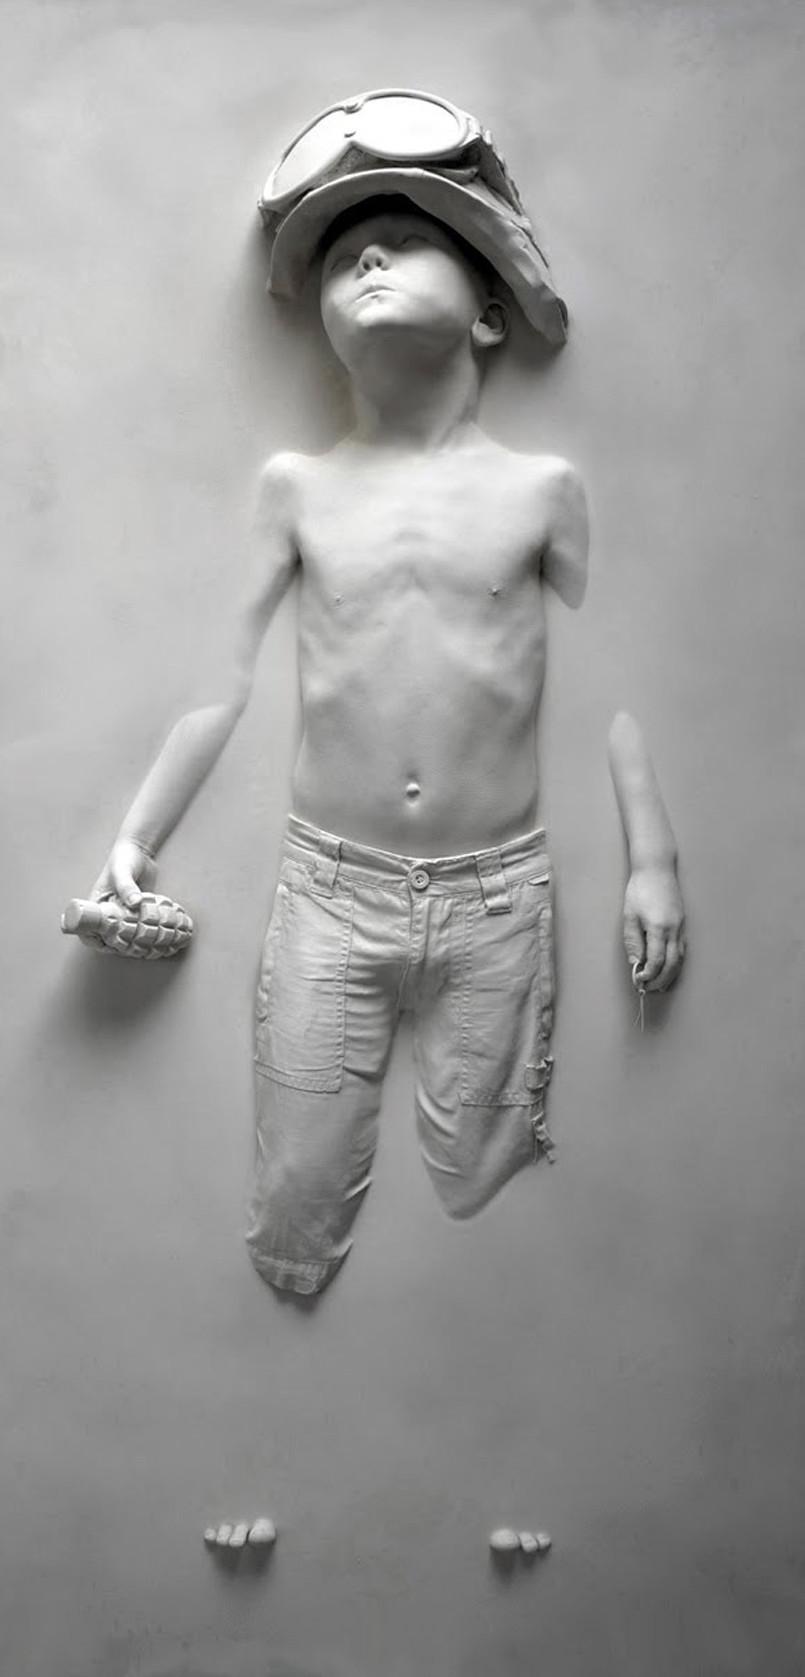 Boy Soldier Panel (Grey) by Schoony